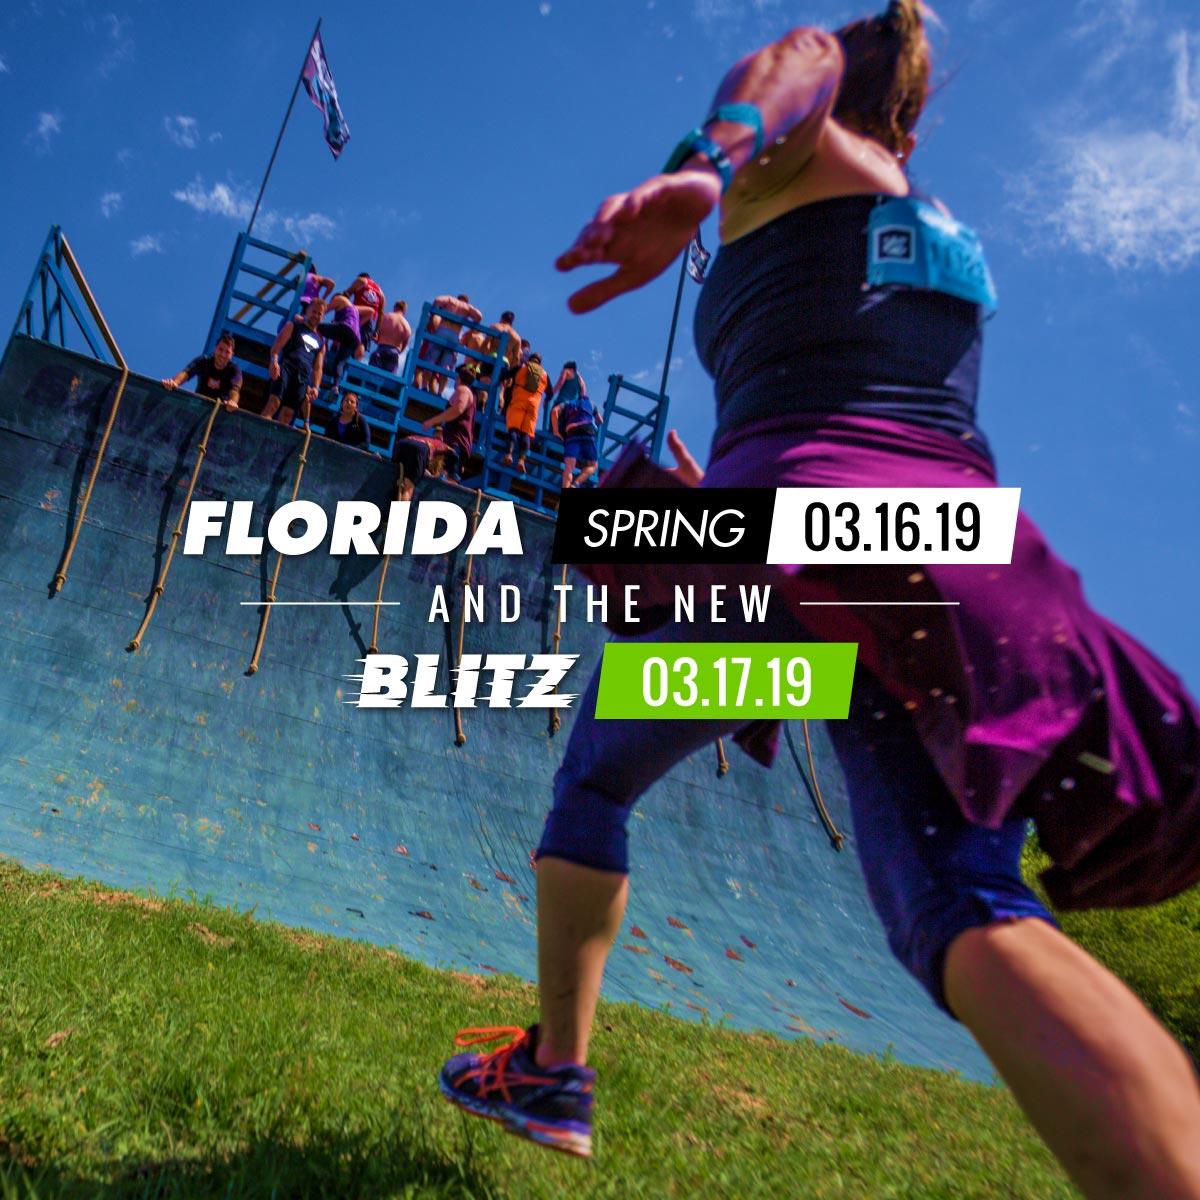 Florida Spring 2019